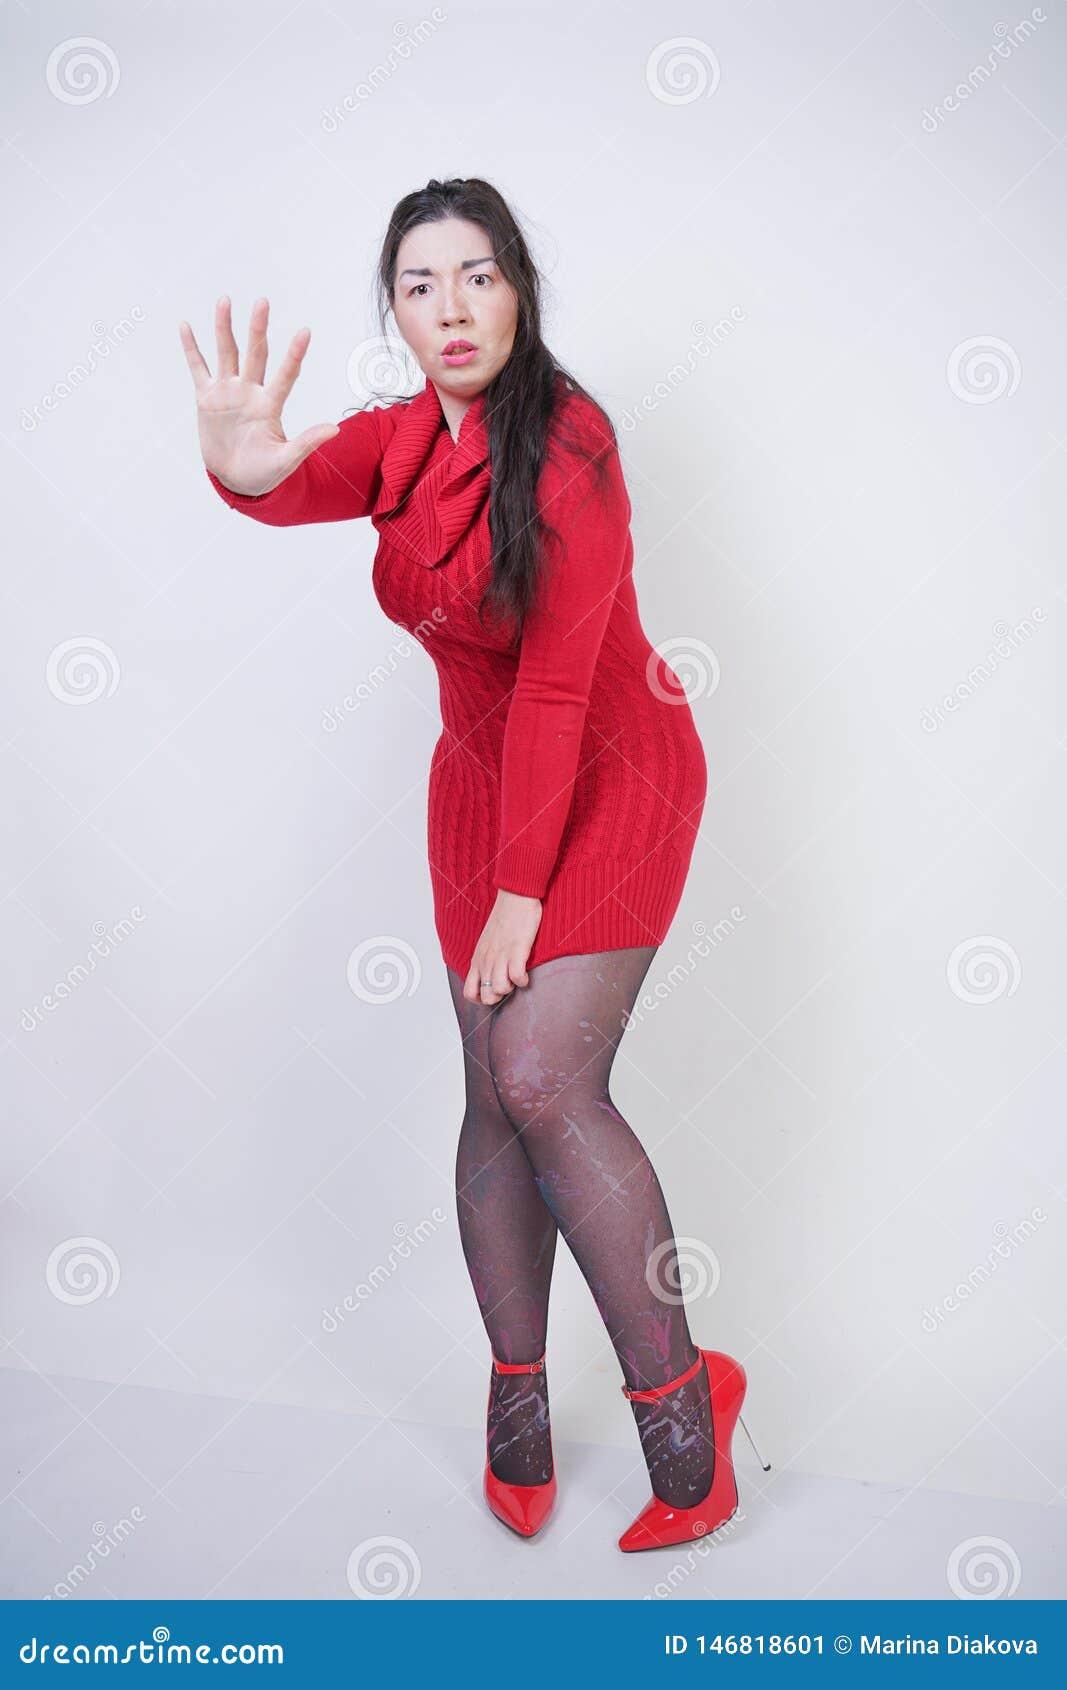 Chubby young girl pantyhose